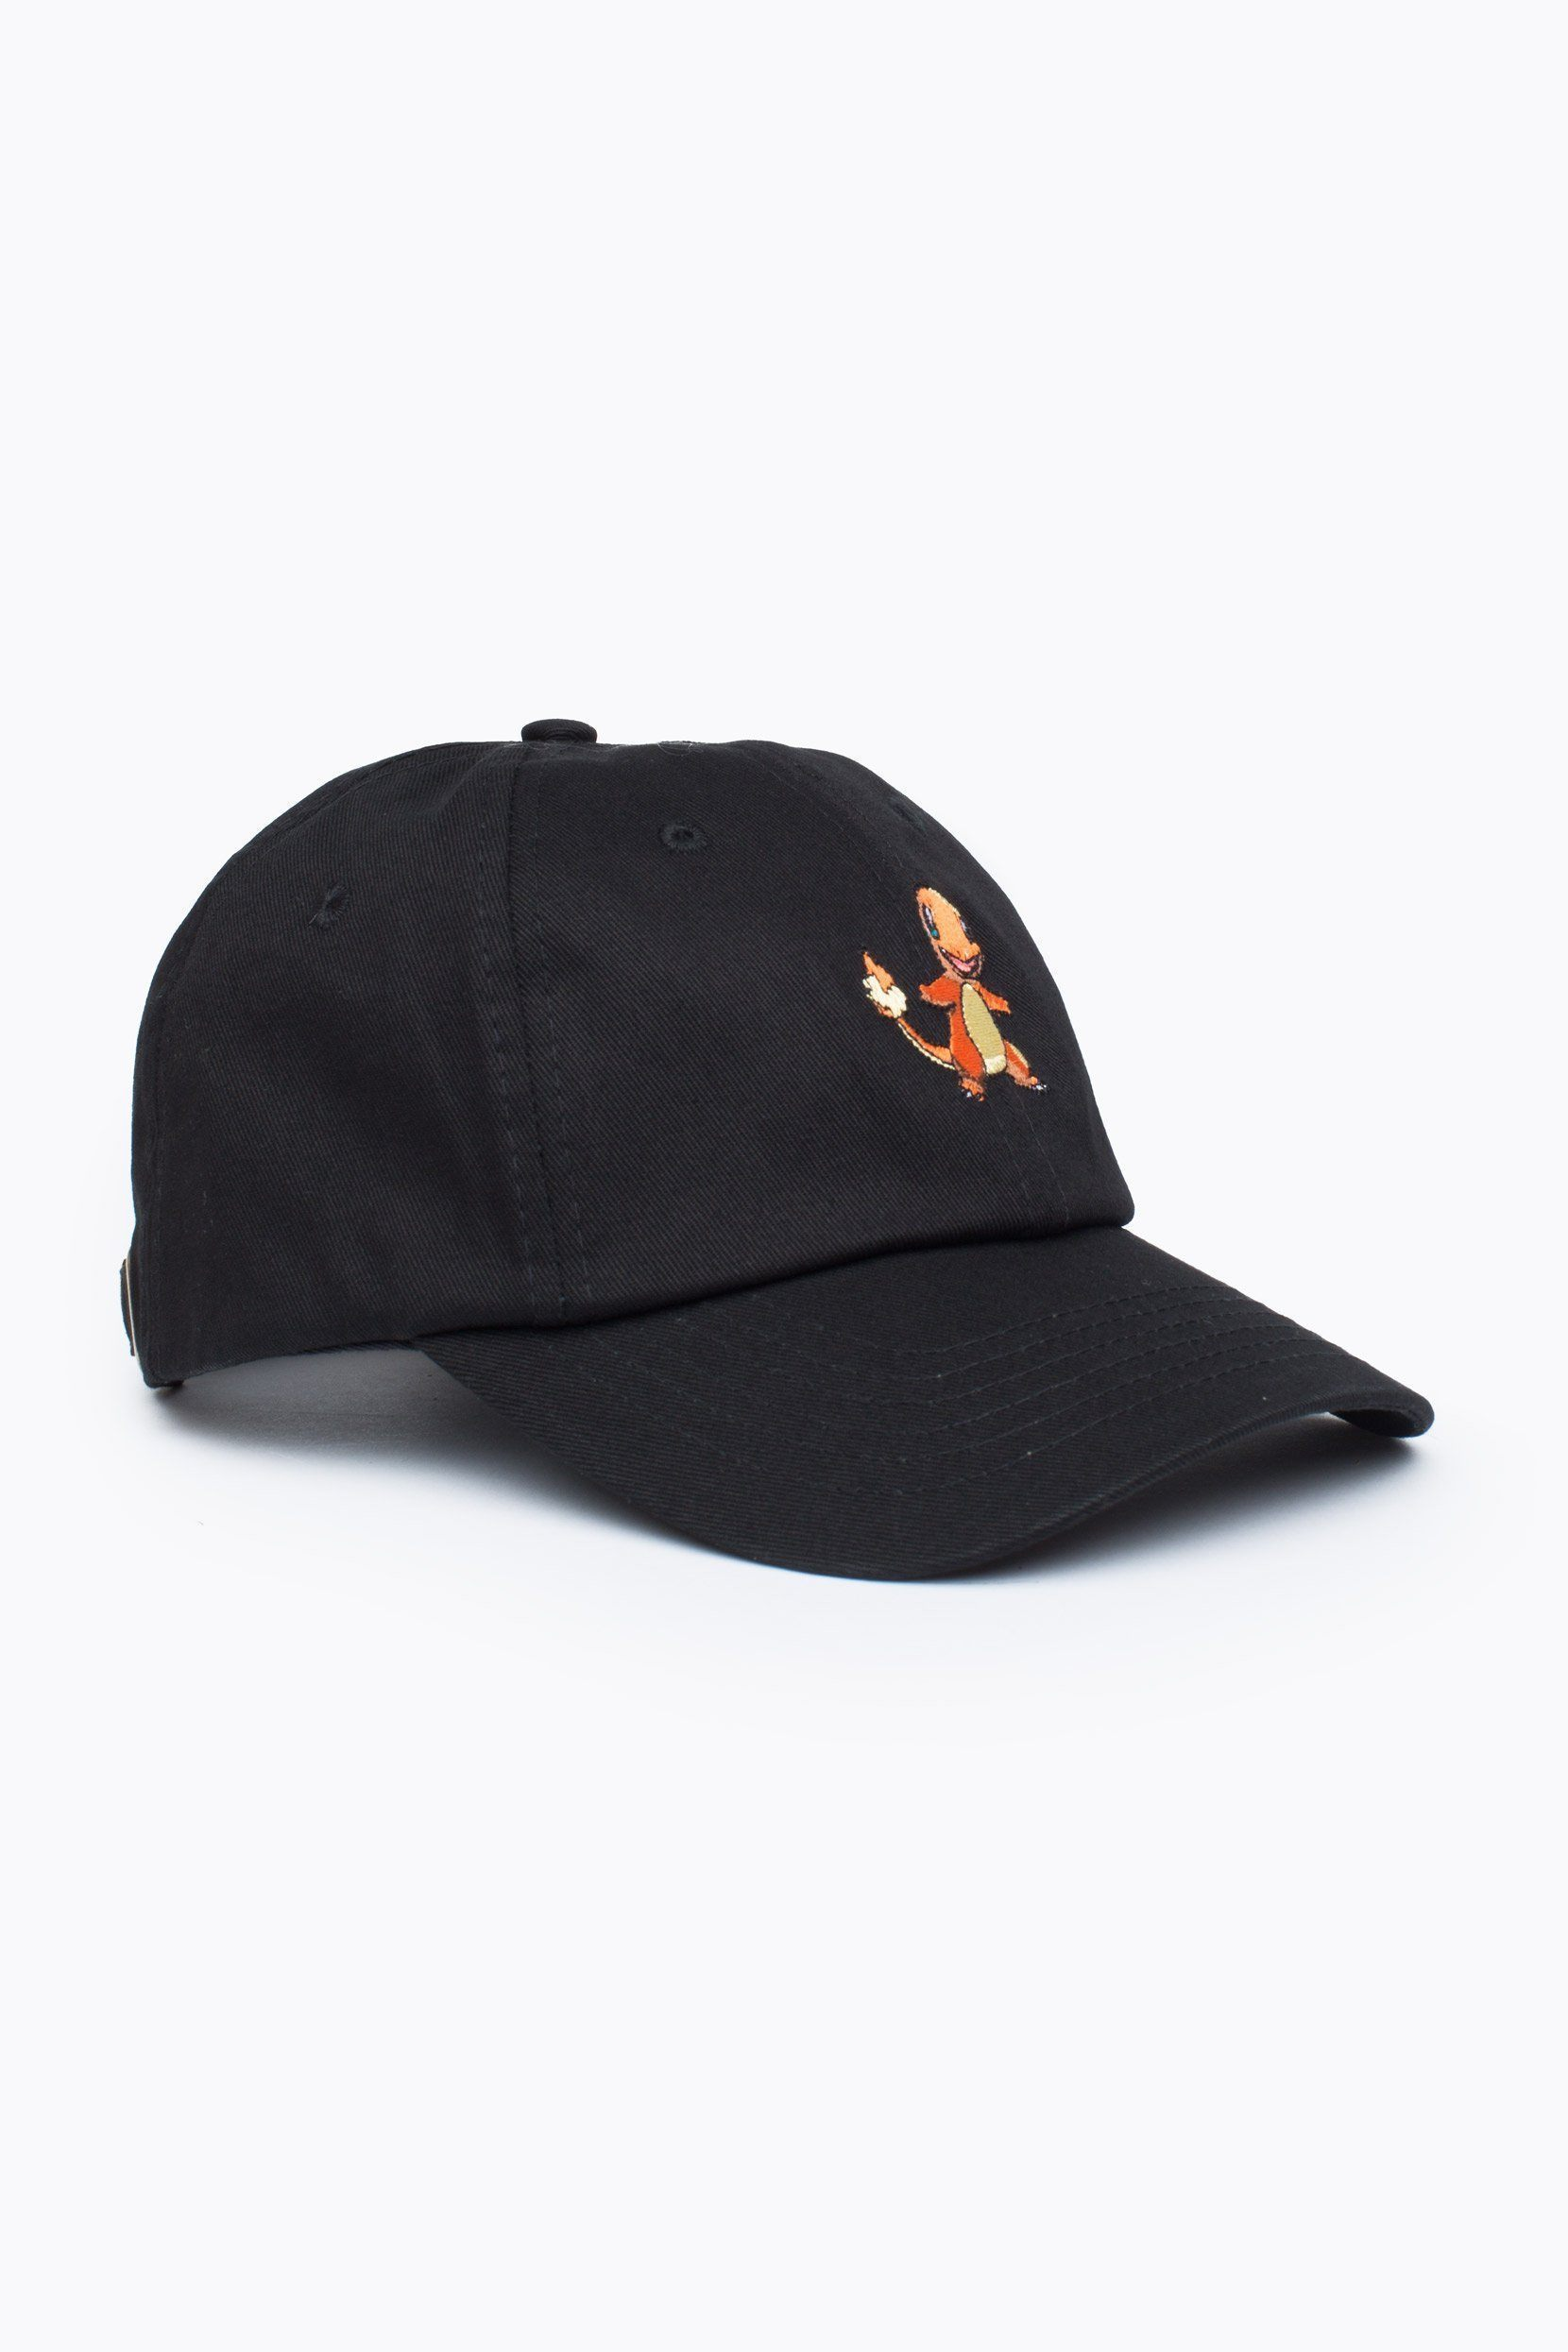 HYPE X Pokemon Black Charmander Dad Hat